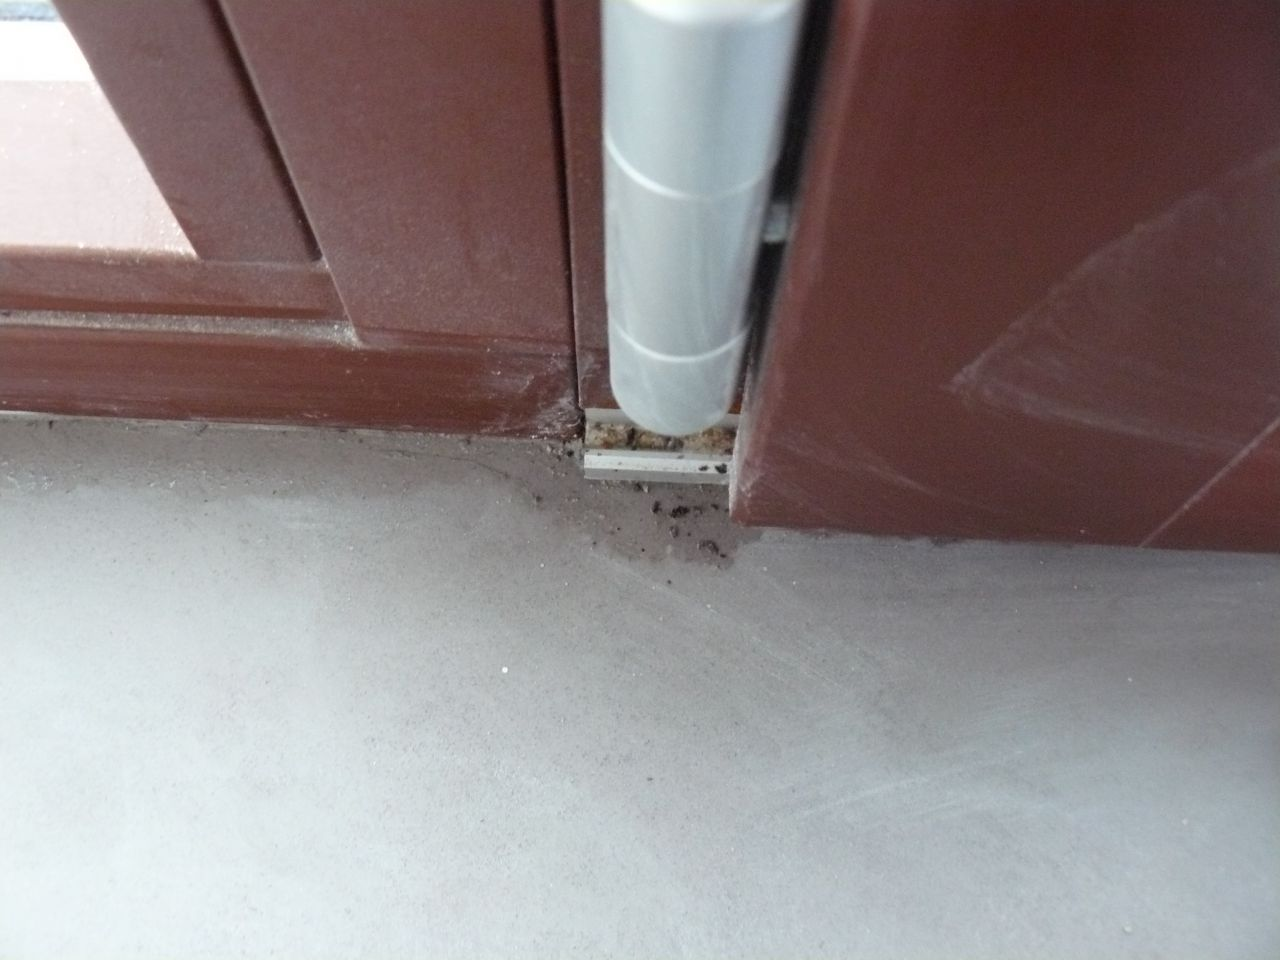 infiltration de la baie Ouest de ma maison GLV (baie INTERNORM, un tiers ouvrant ÃÃ'ƒÃÂÂ'Ã'ƒÃƒÃÂ'Â'ÃÂÂ'Ã' la franÃÃ'ƒÃÂÂ'Ã'ƒÃƒÃÂ'Â'ÃÂÂ'Ã'§aise - 2/3 fixe) <br /> la maison est neuve (mai 2012)